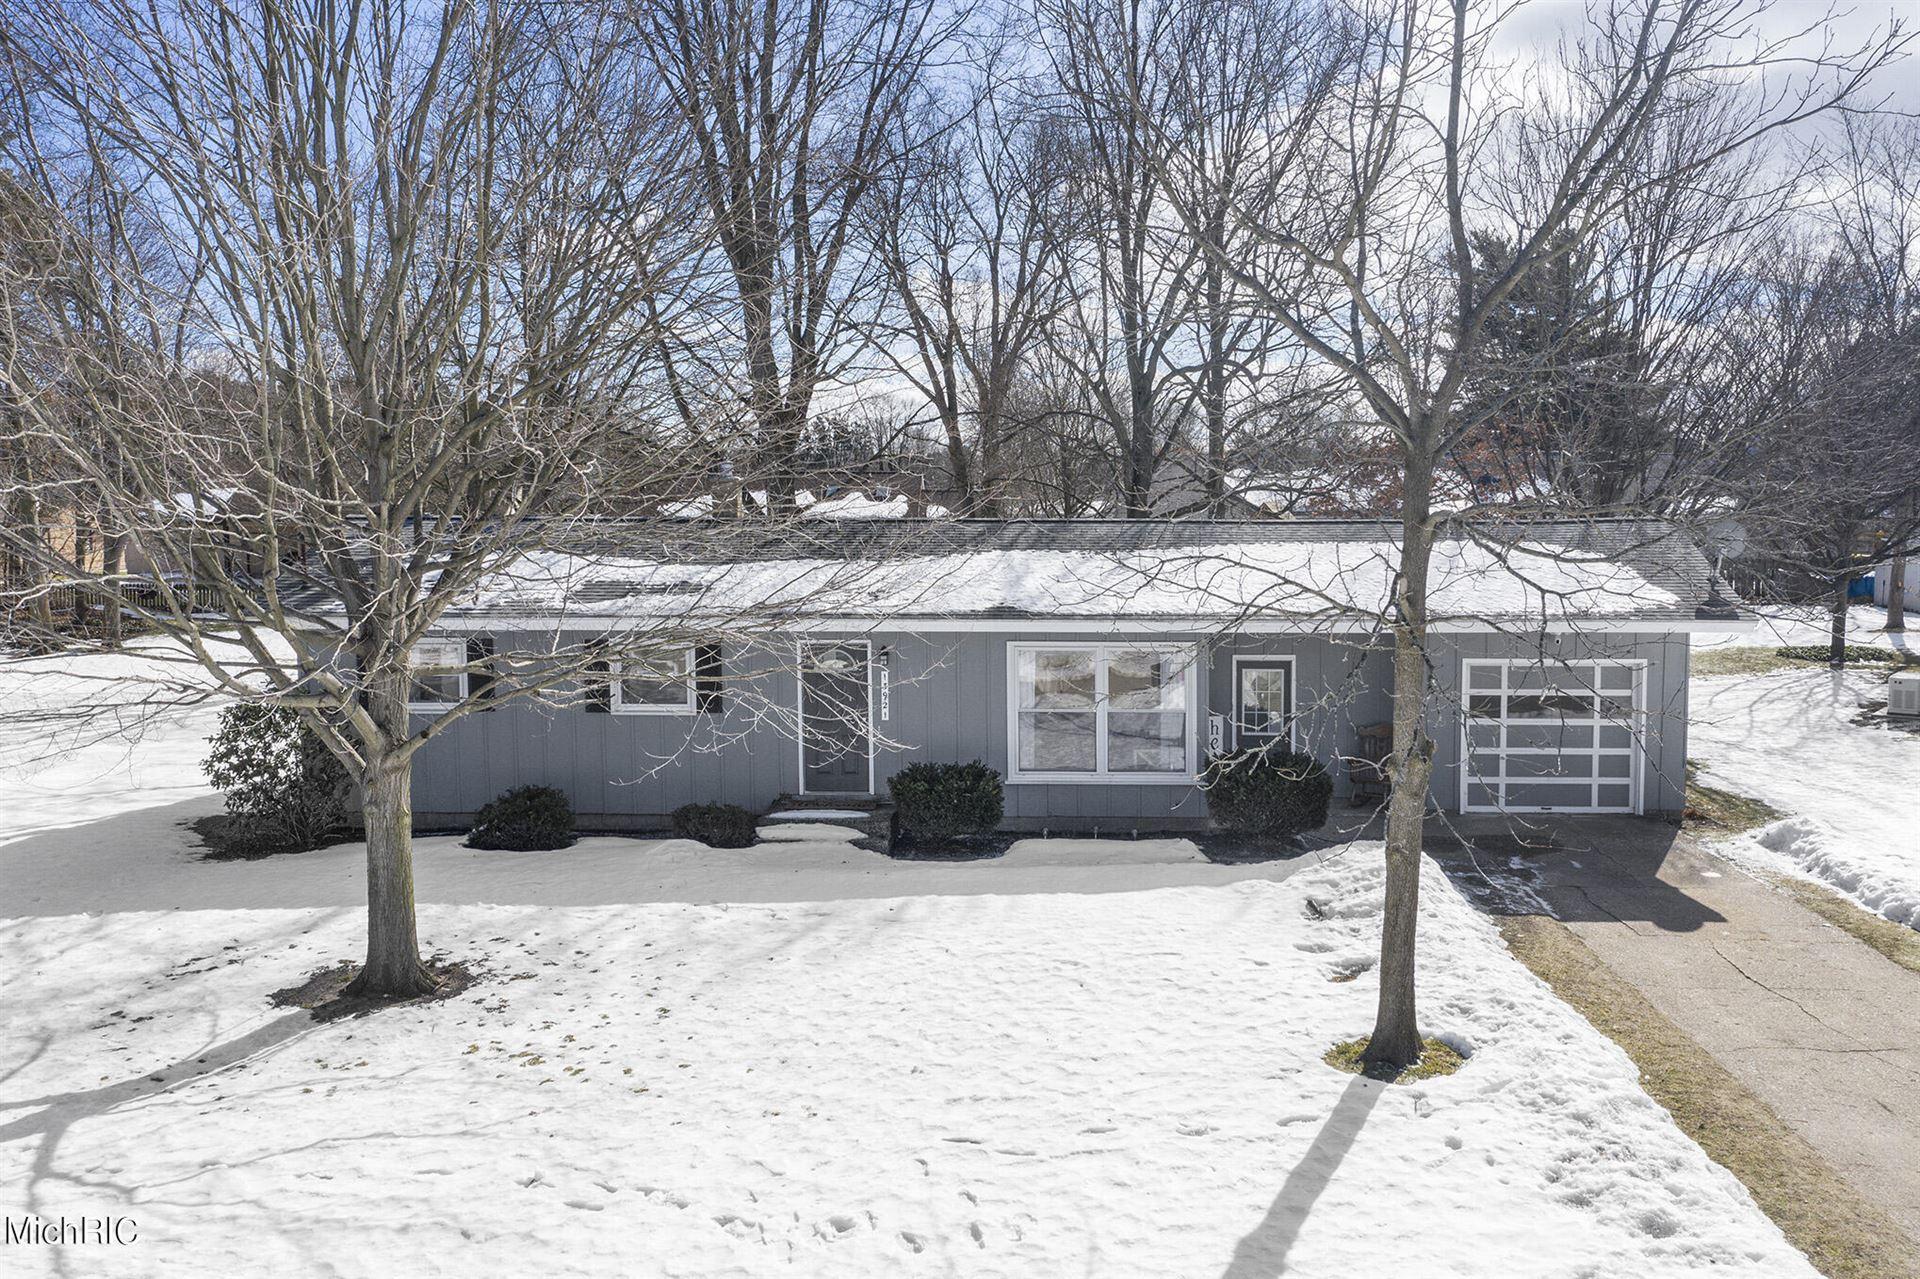 Photo of 13921 Ridgewood Drive, Holland, MI 49424 (MLS # 21006318)